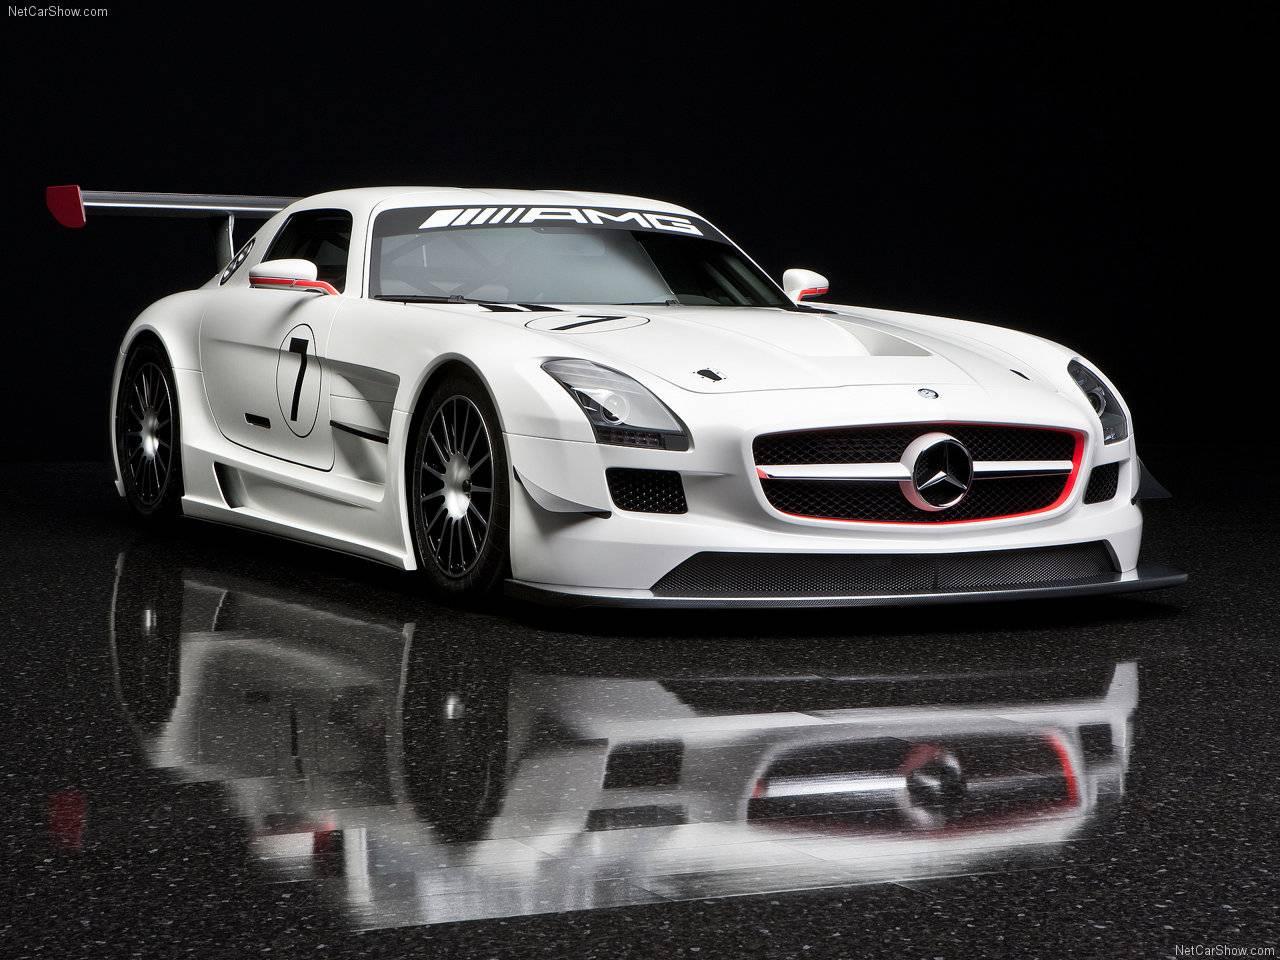 http://4.bp.blogspot.com/_xhqjRo6NERQ/S7DK61tyAOI/AAAAAAAAGw8/DfxMCmb7iMw/s1600/Mercedes-Benz-SLS_AMG_GT3_2011_1280x960_wallpaper_06.jpg